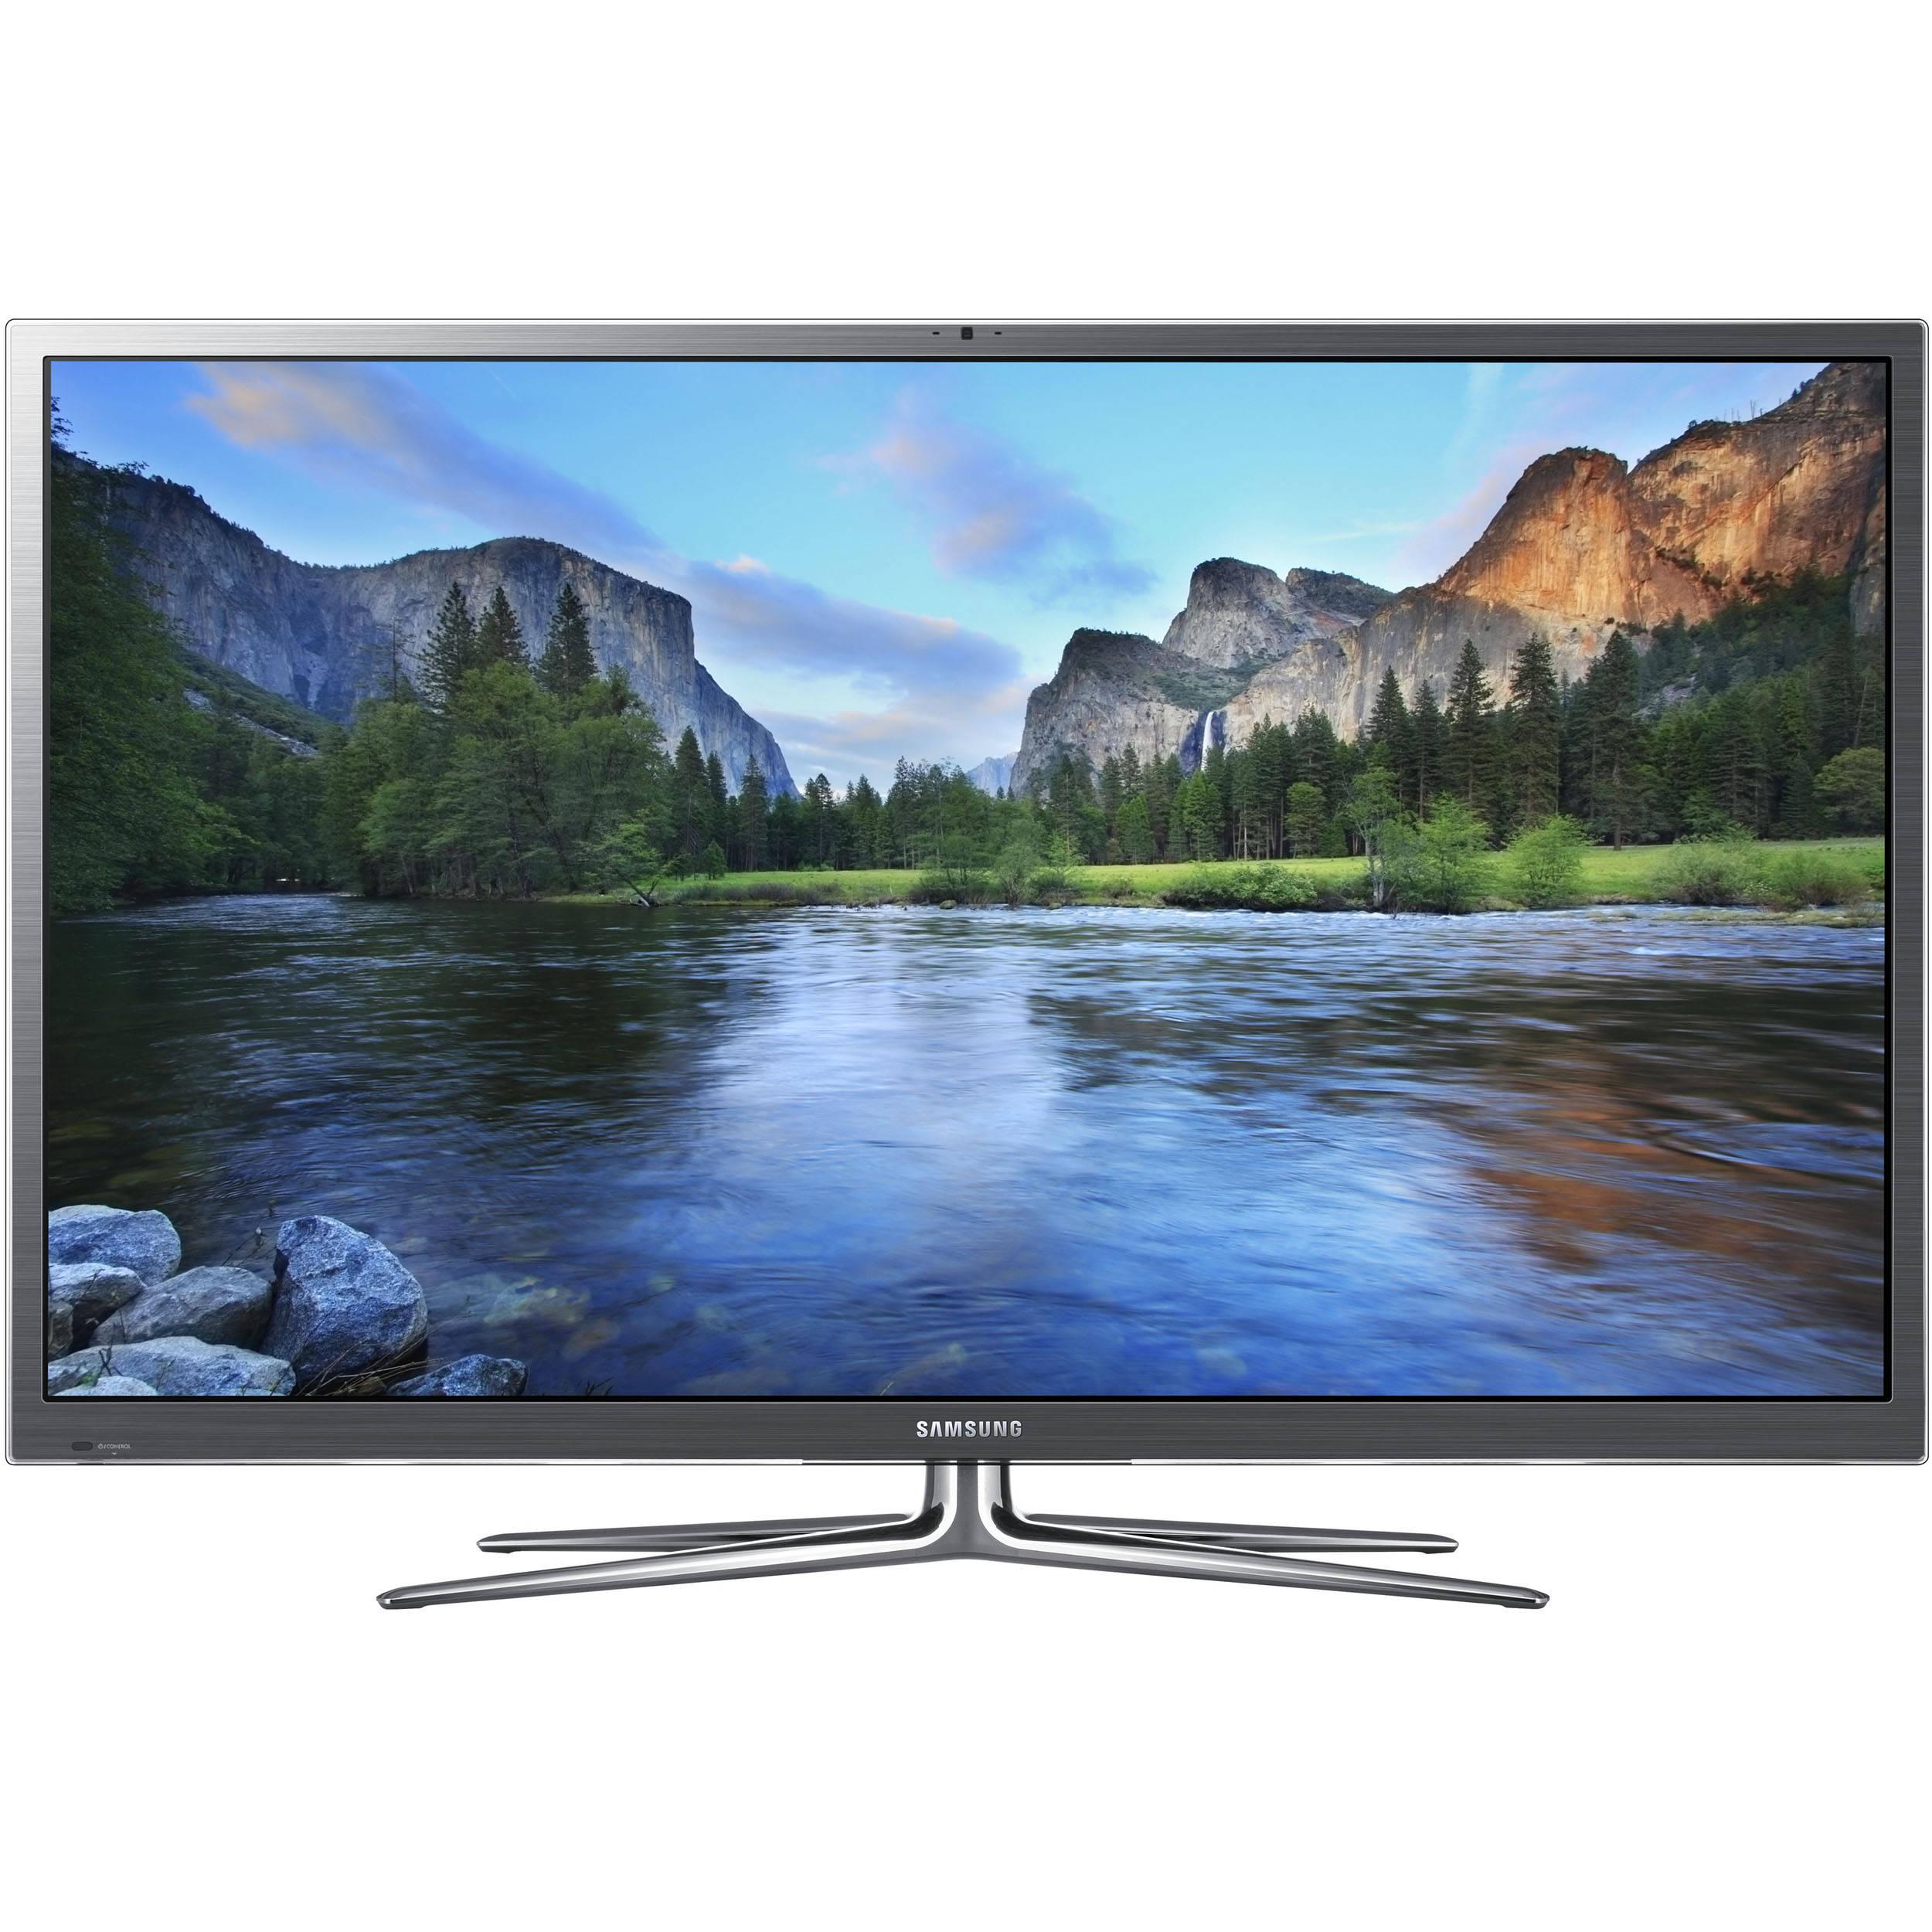 Samsung PN60F5300 Plasma TV. - YouTube